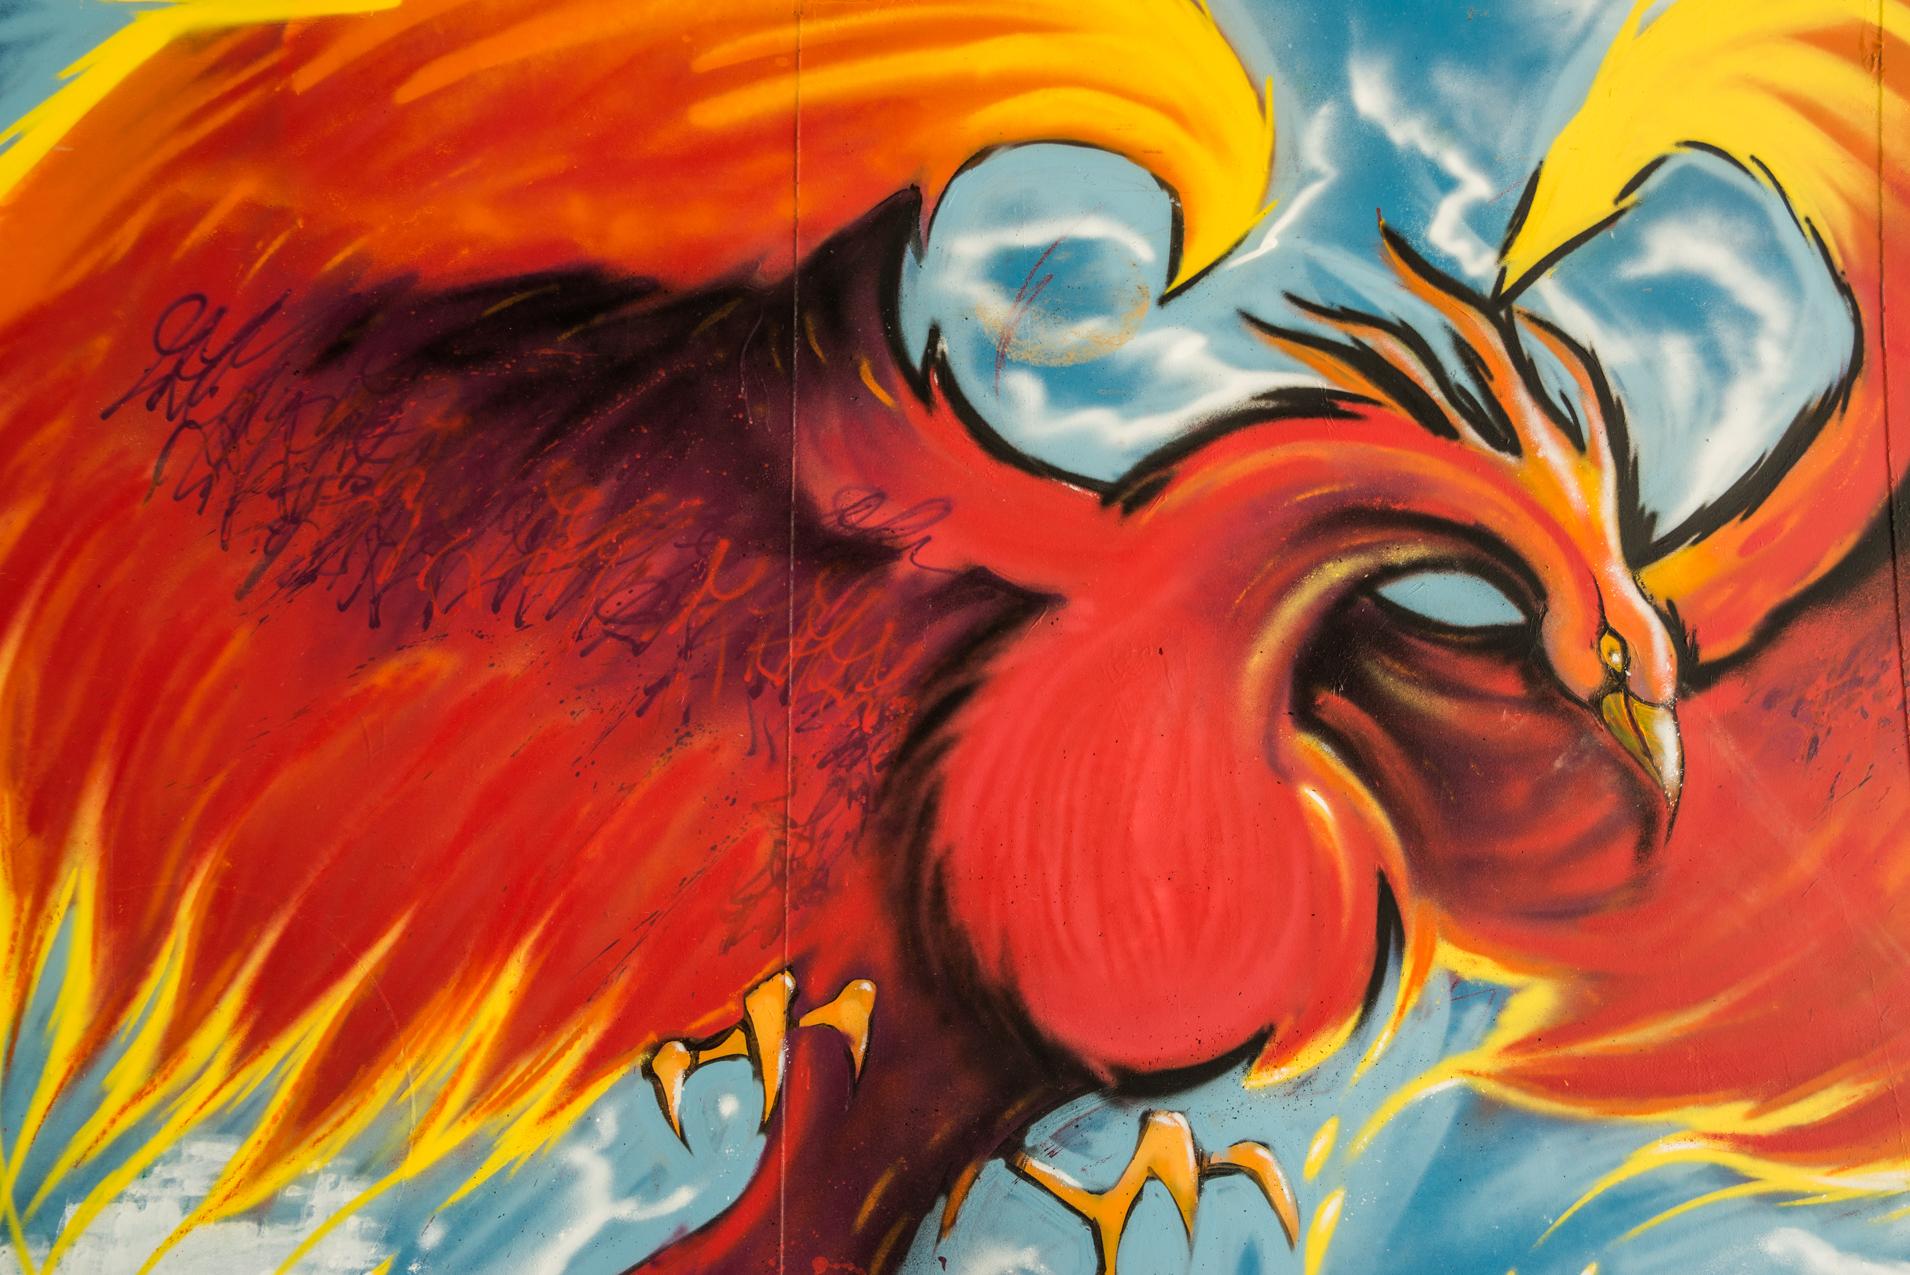 Arche 1 - Oiseau de feu